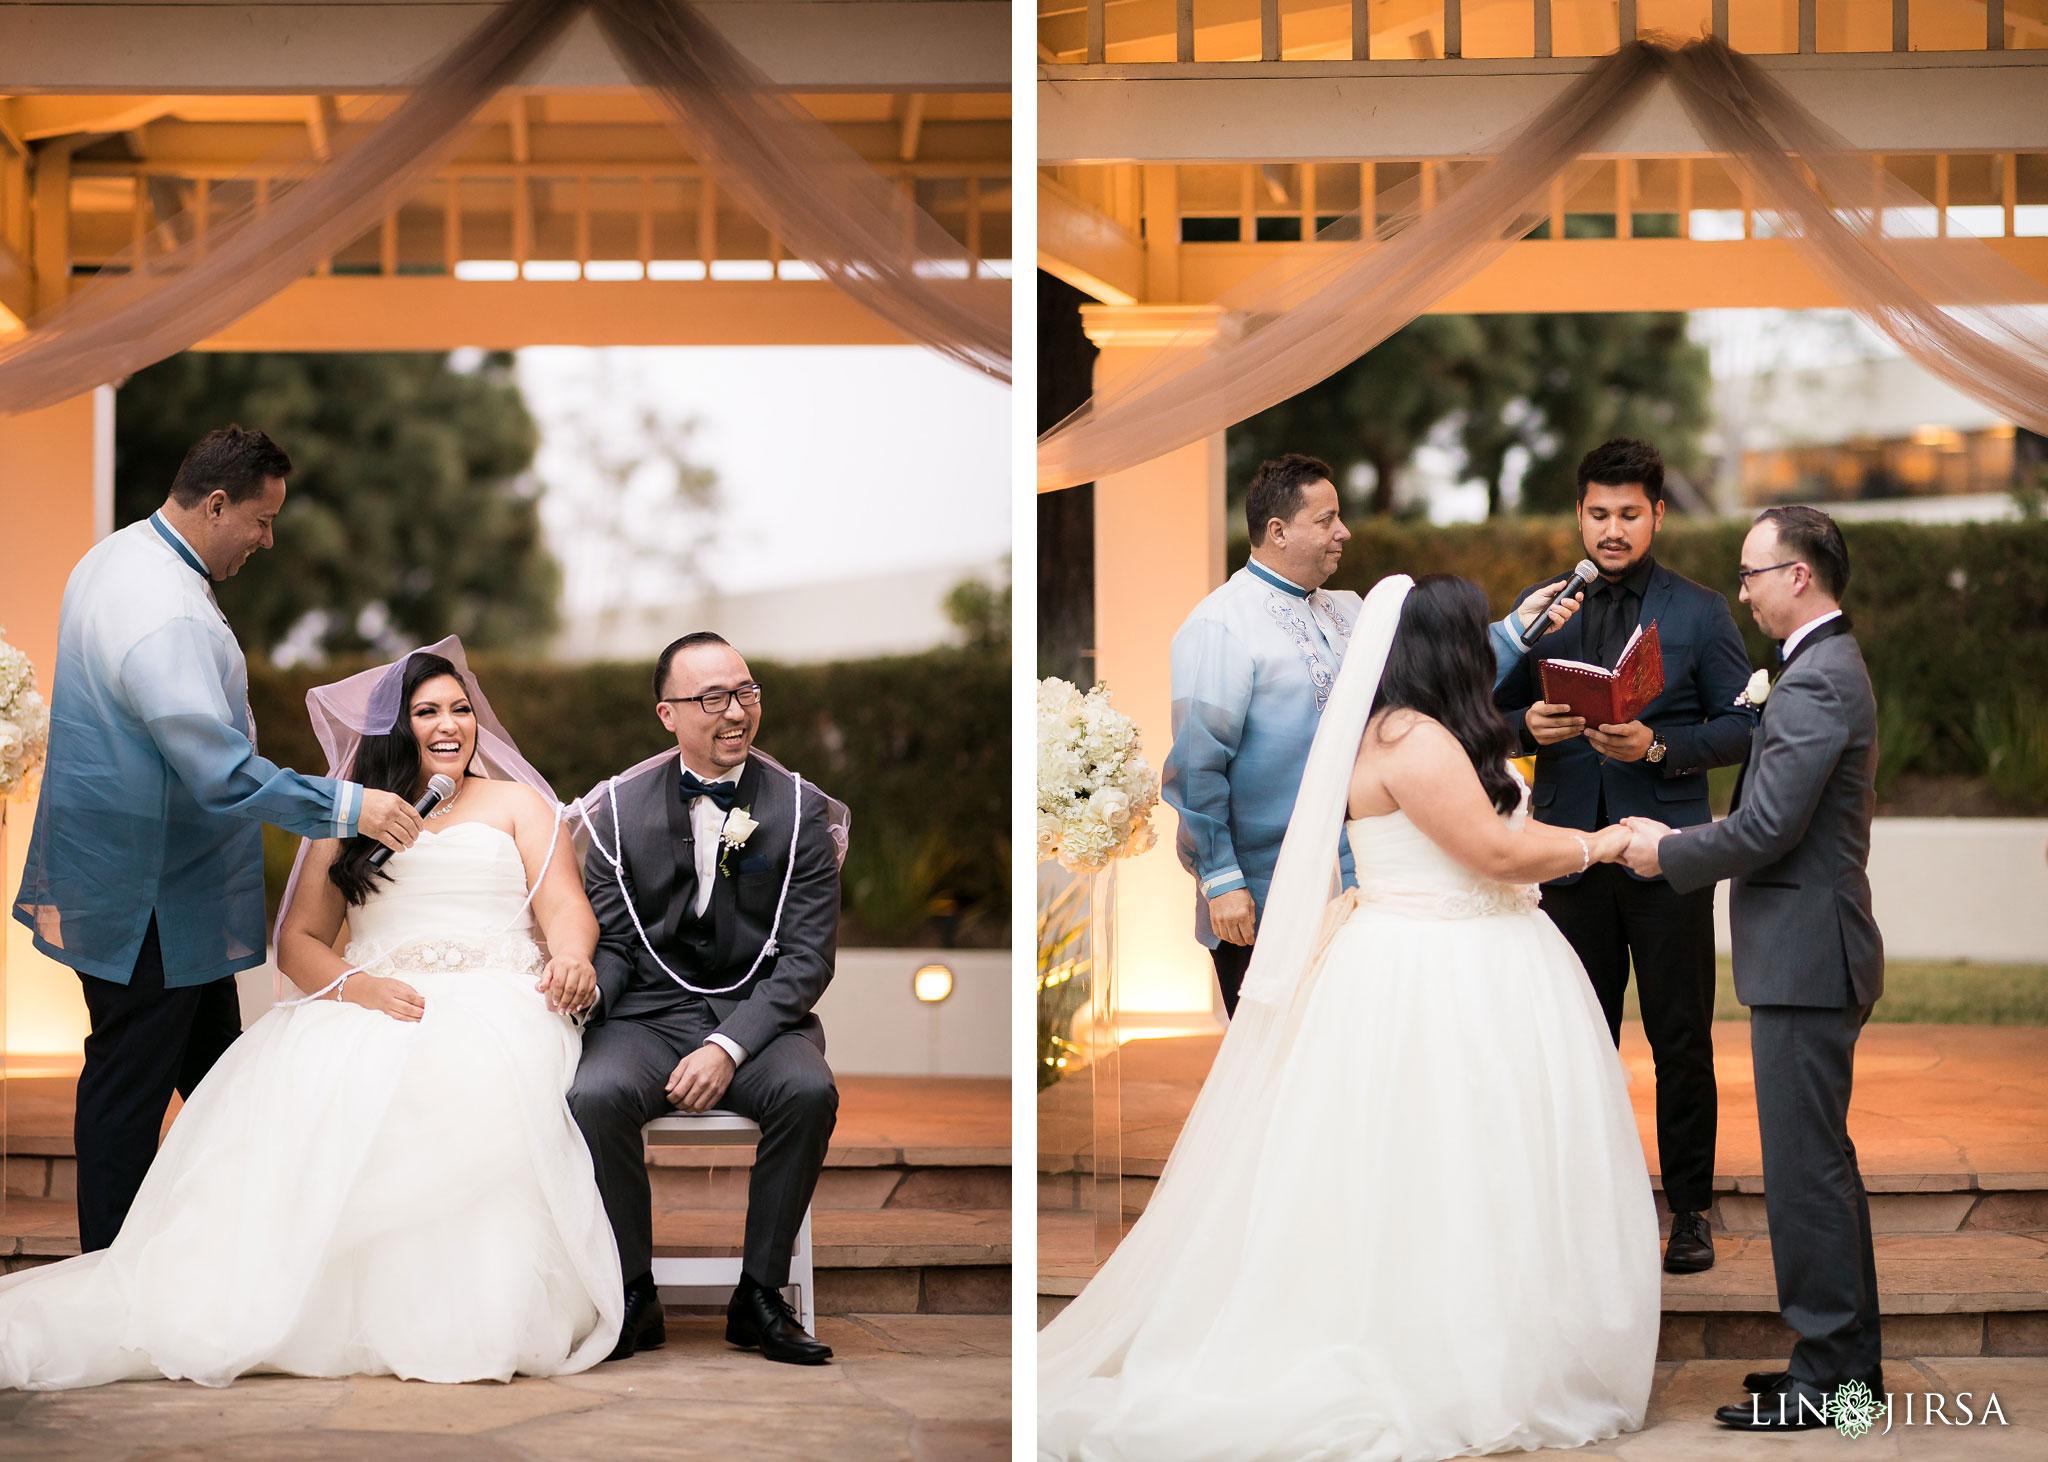 23 turnip rose promenade orange county wedding ceremony photography